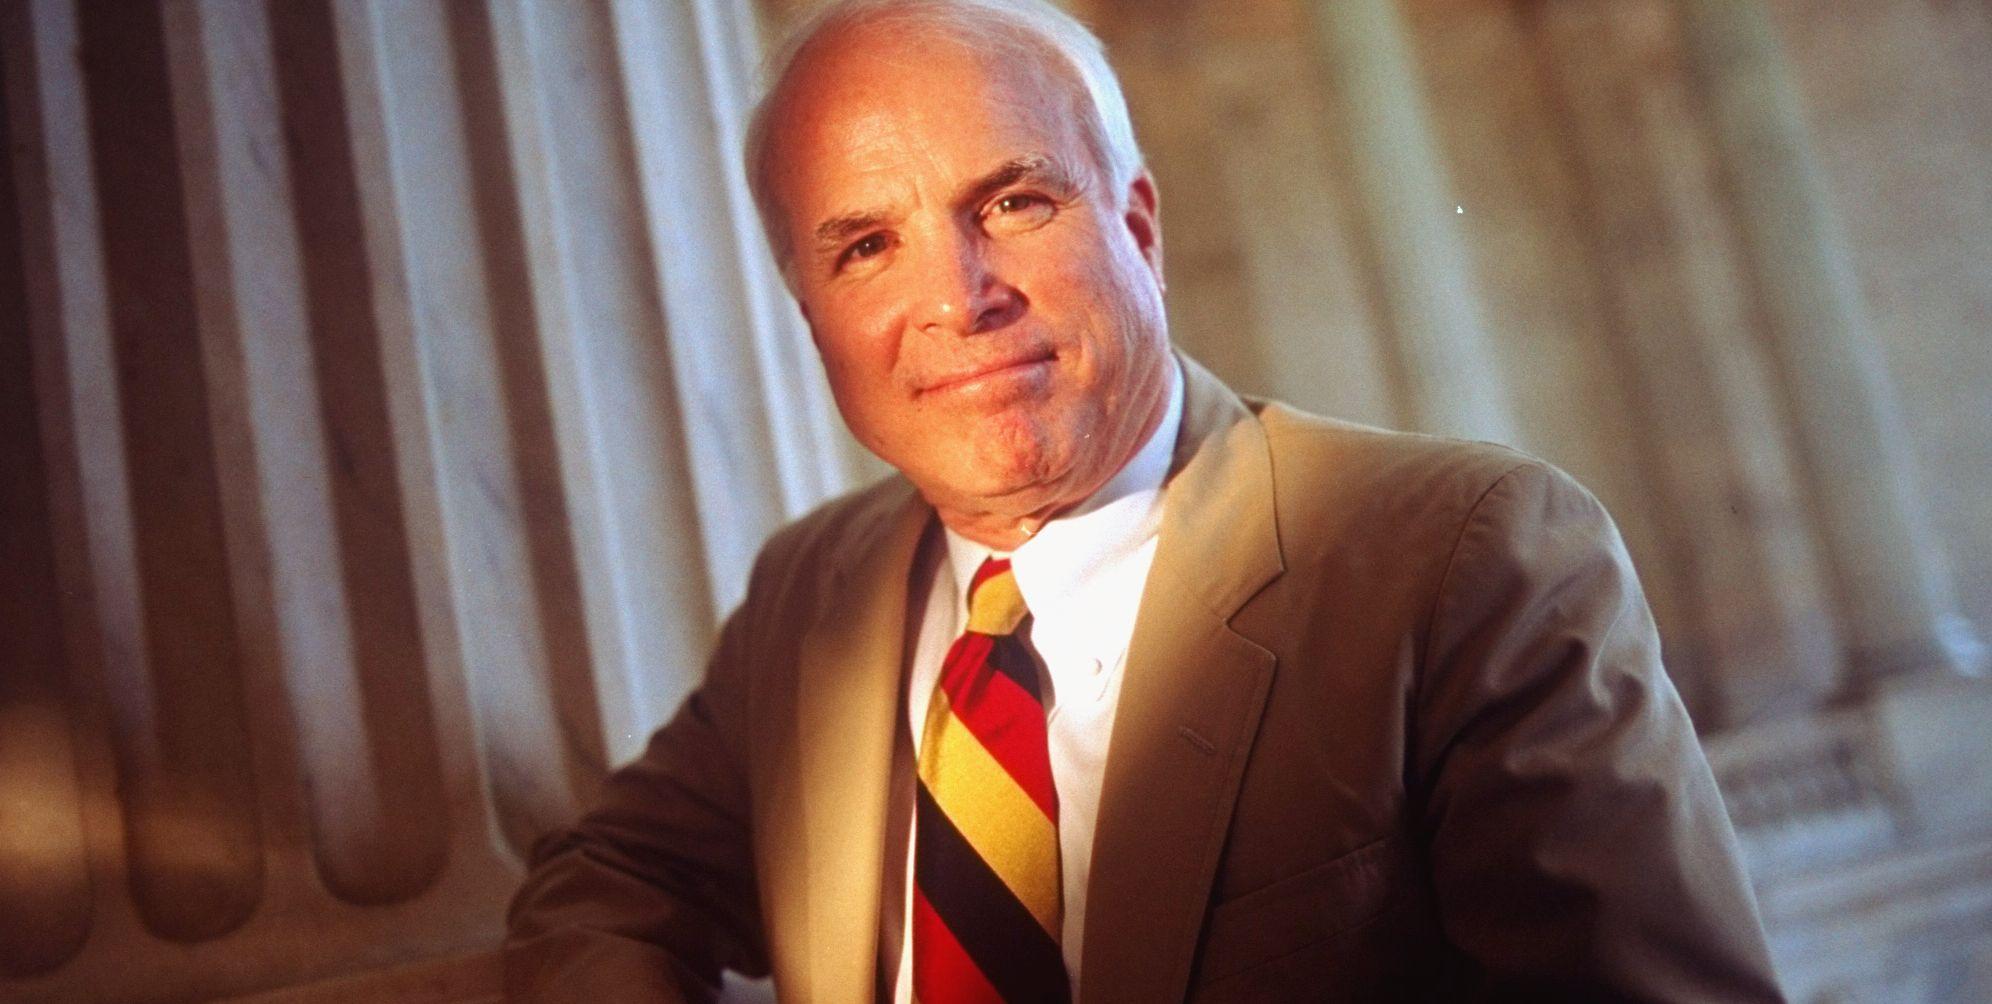 Portrait Of Senator McCain